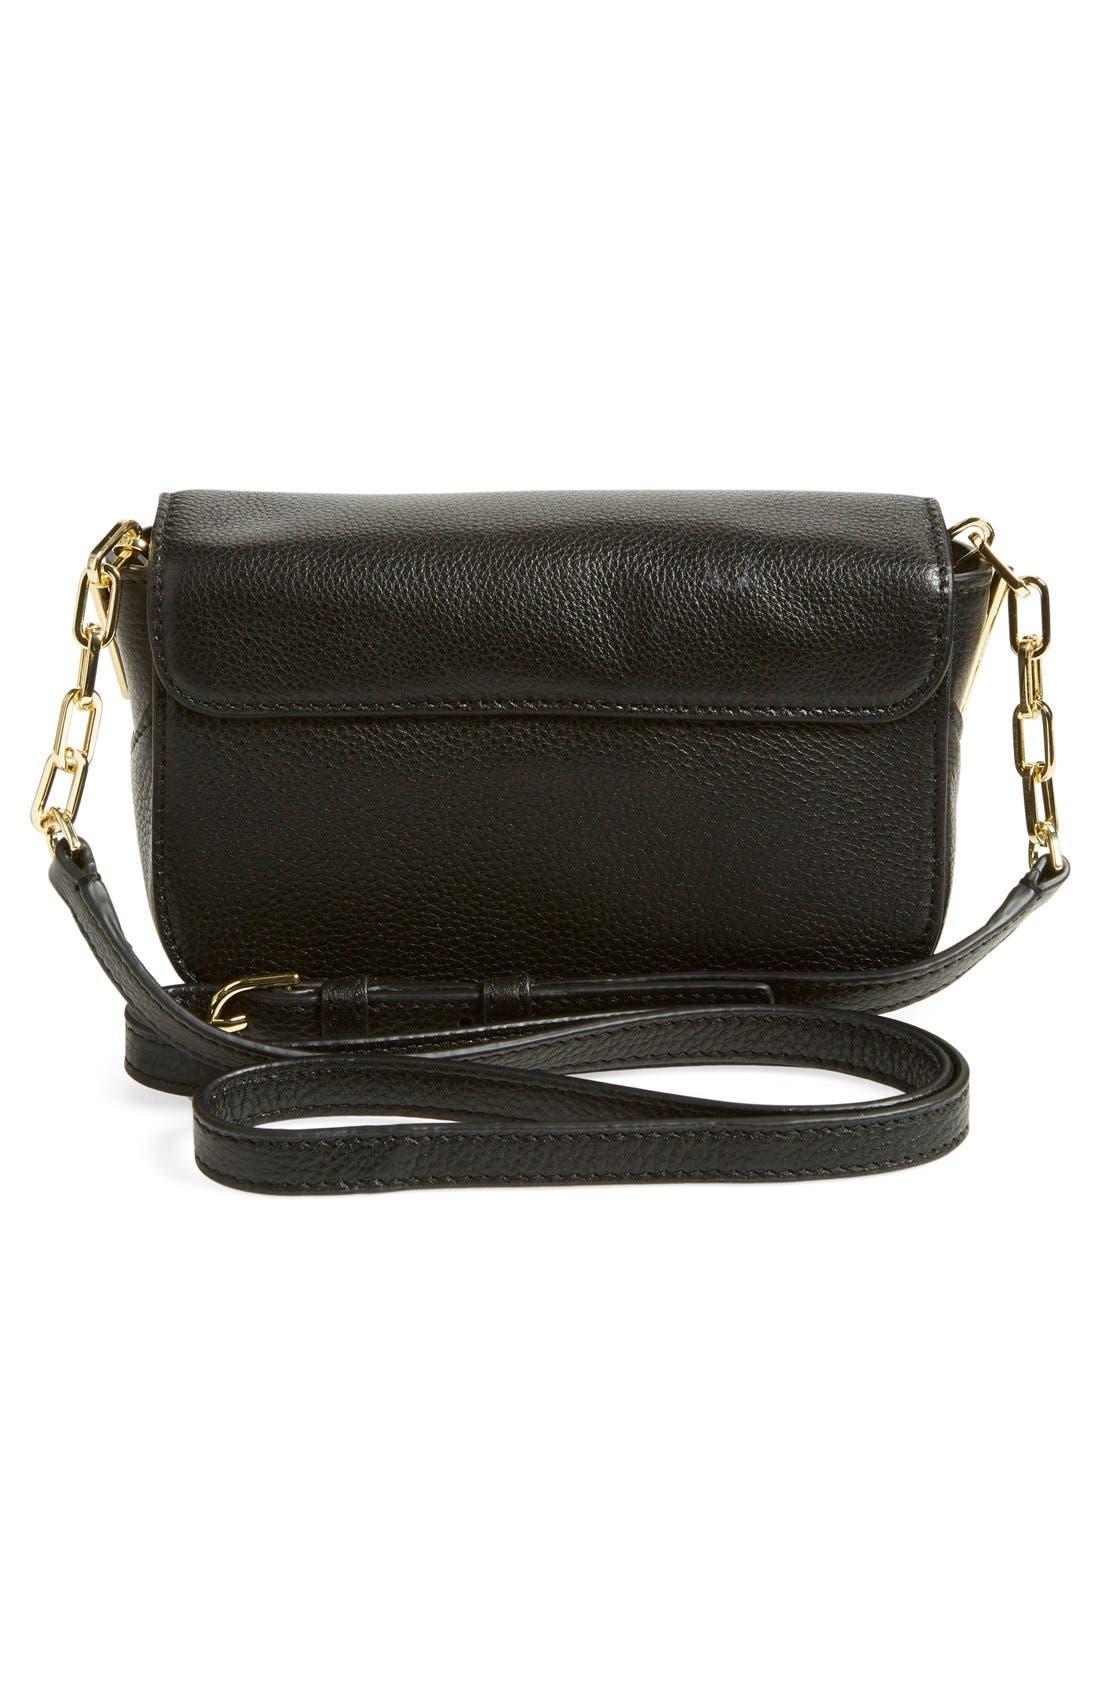 TORY BURCH, Mini Leather Crossbody Bag, Alternate thumbnail 2, color, 001